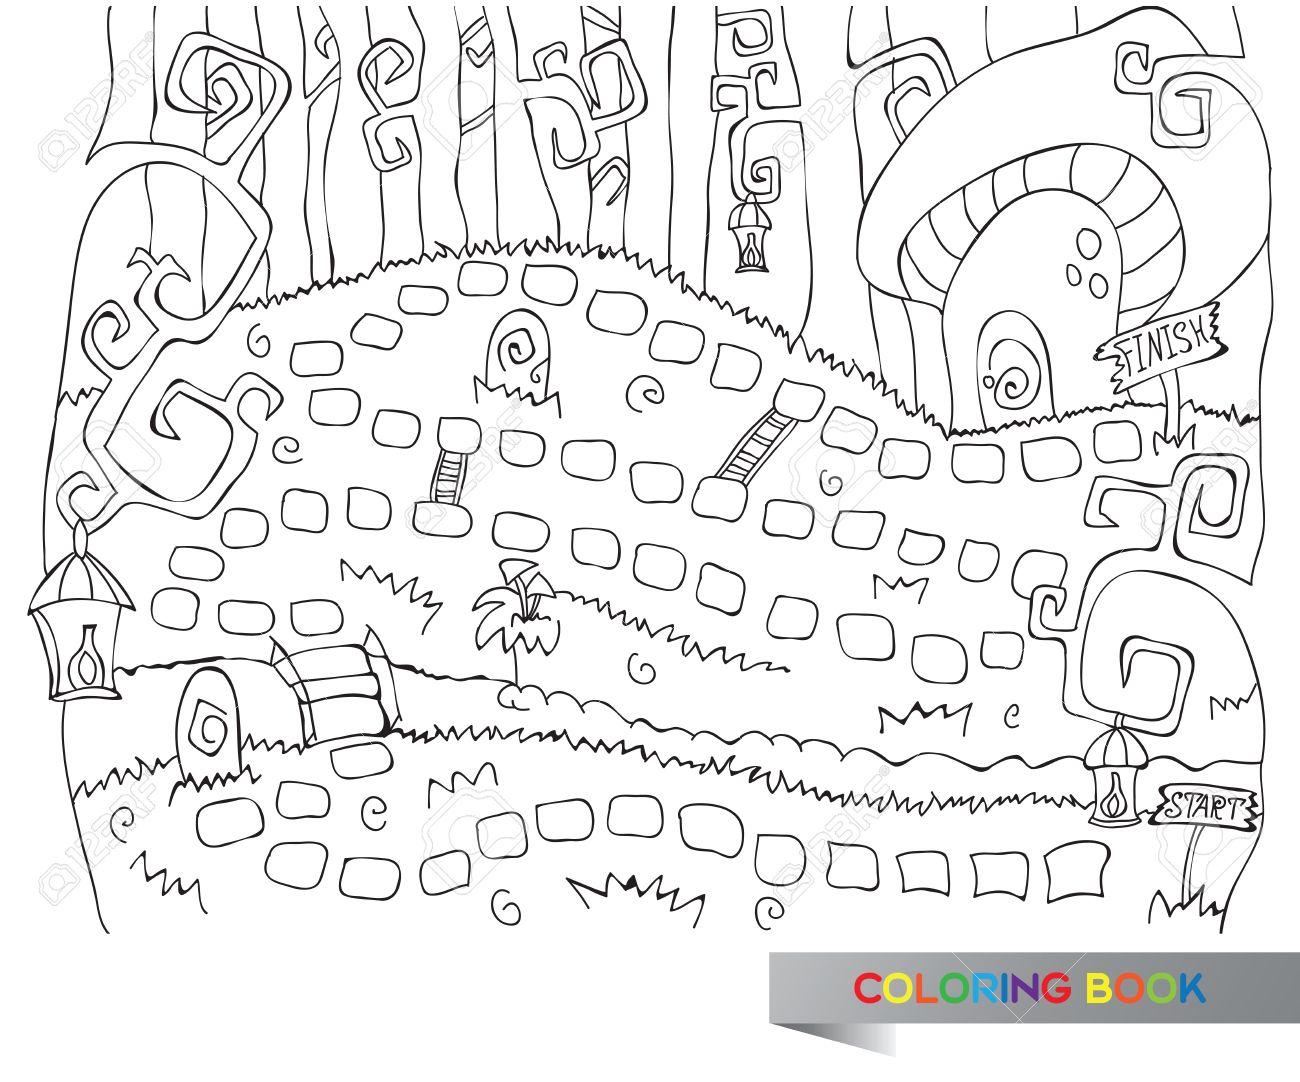 Vector Illustration Of Board Game For Children - Coloring Book ...